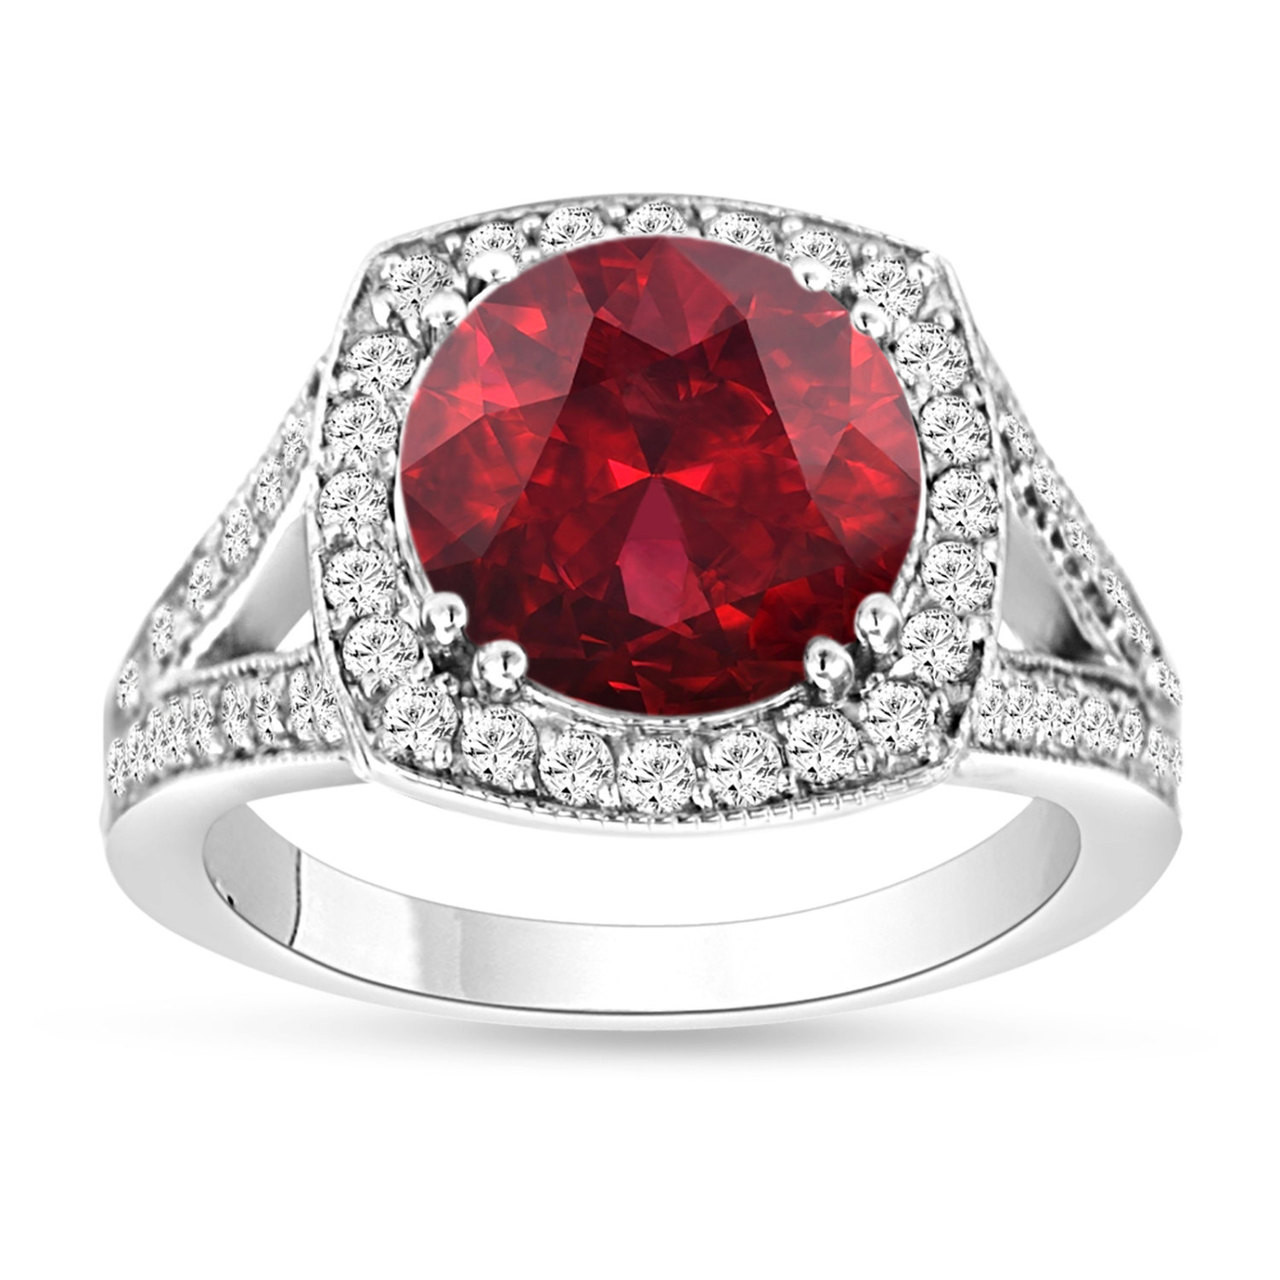 Garnet & Diamond Engagement Ring 14k White Gold 335 Carat Pave Set  Handmade Certified Birthstone Huge Halo $1,90000